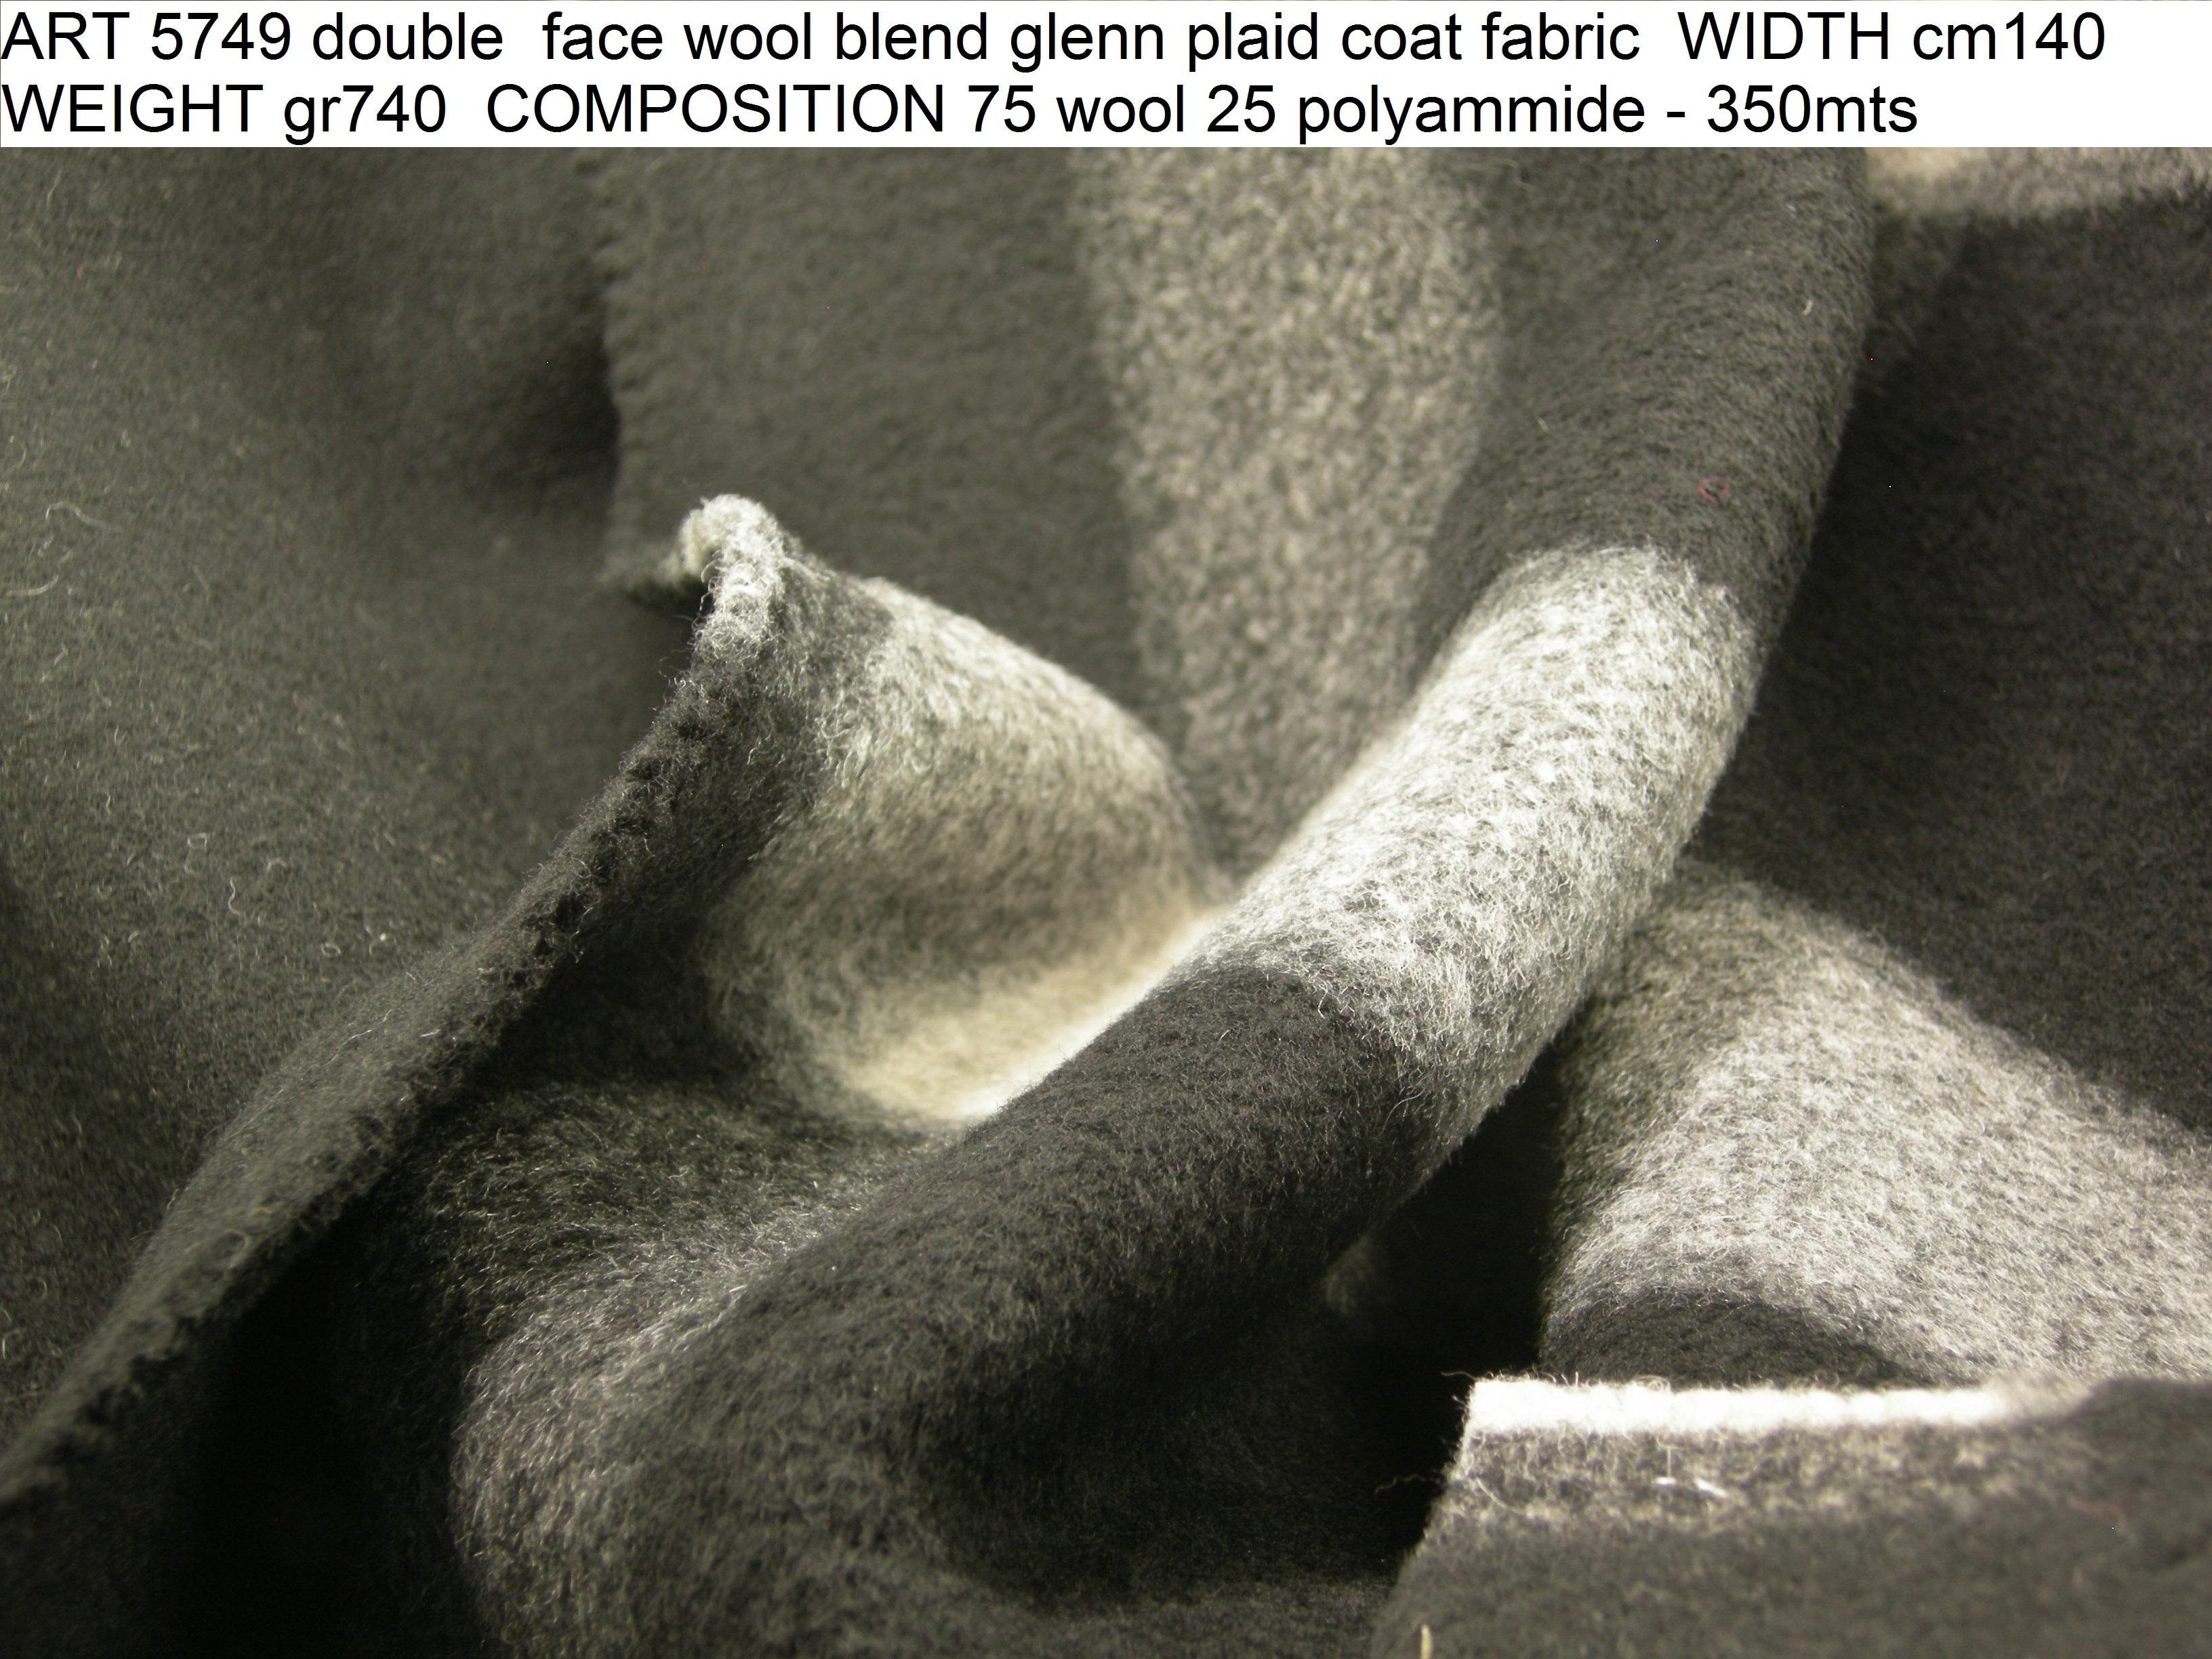 ART 5749 double face wool blend glenn plaid coat fabric WIDTH cm140 WEIGHT gr740 COMPOSITION 75 wool 25 polyammide - 350mts